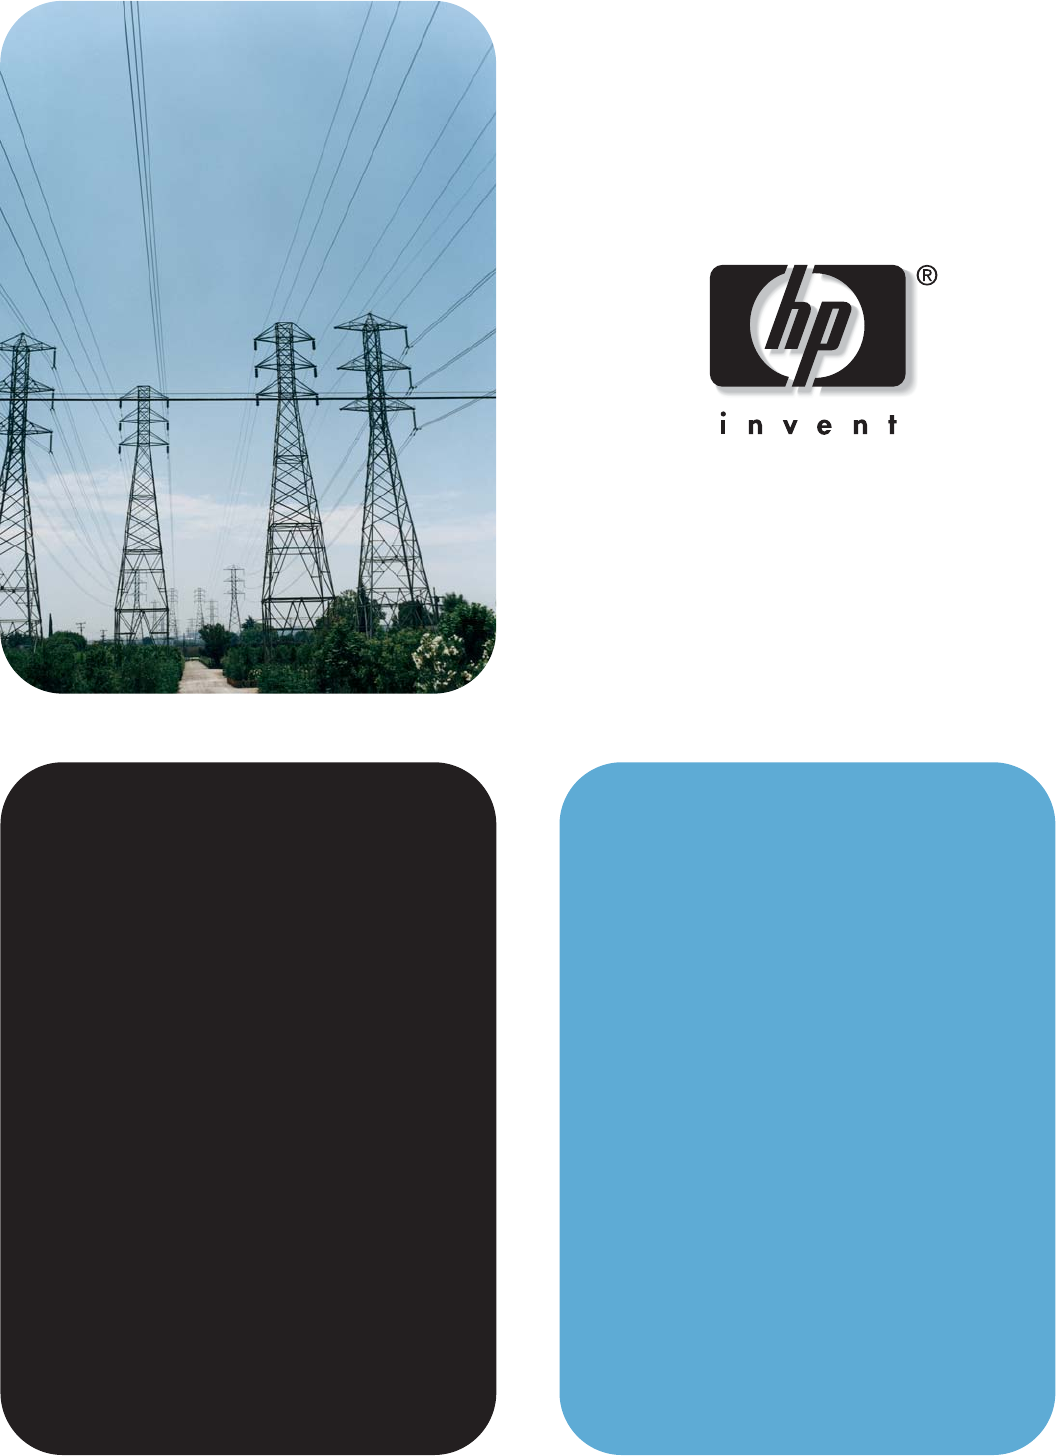 HP LASERJET 9055MFP DRIVERS FOR WINDOWS 8